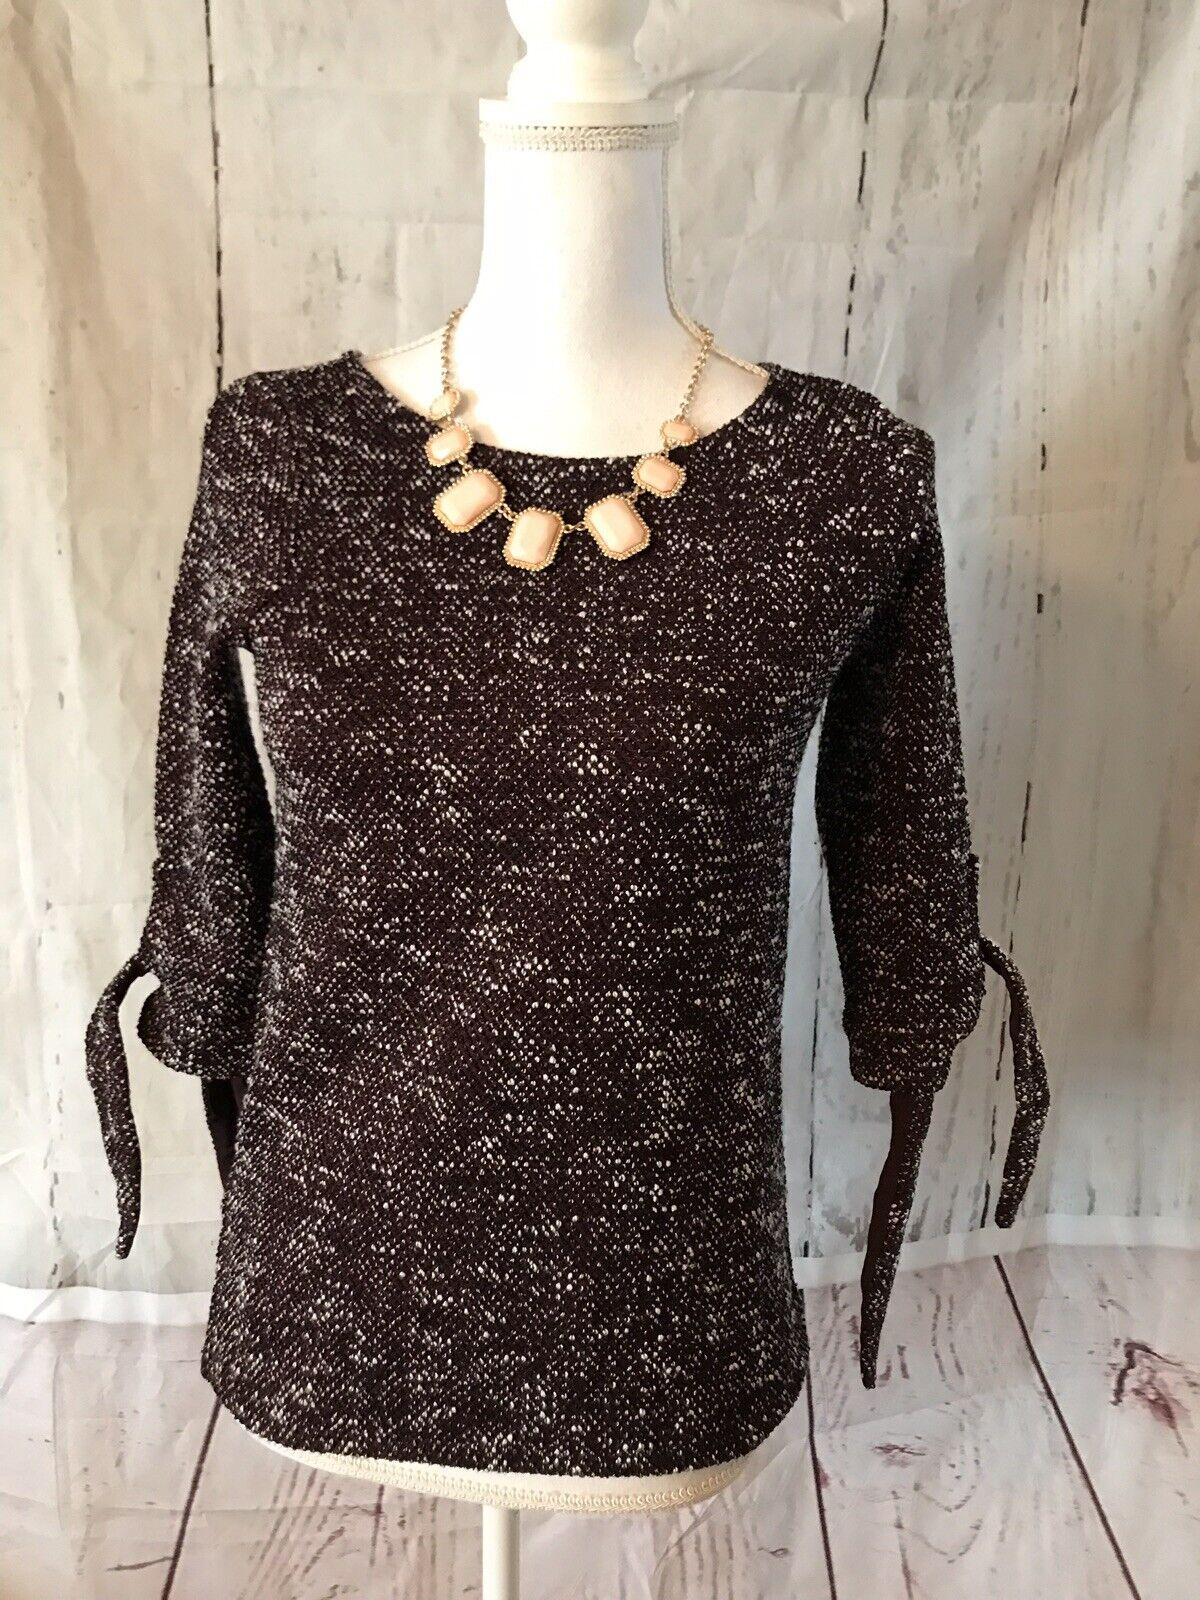 Ann Taylor XXS Petite Burgundy 3 4 Sleeve Melange Knit Bow Tie Top